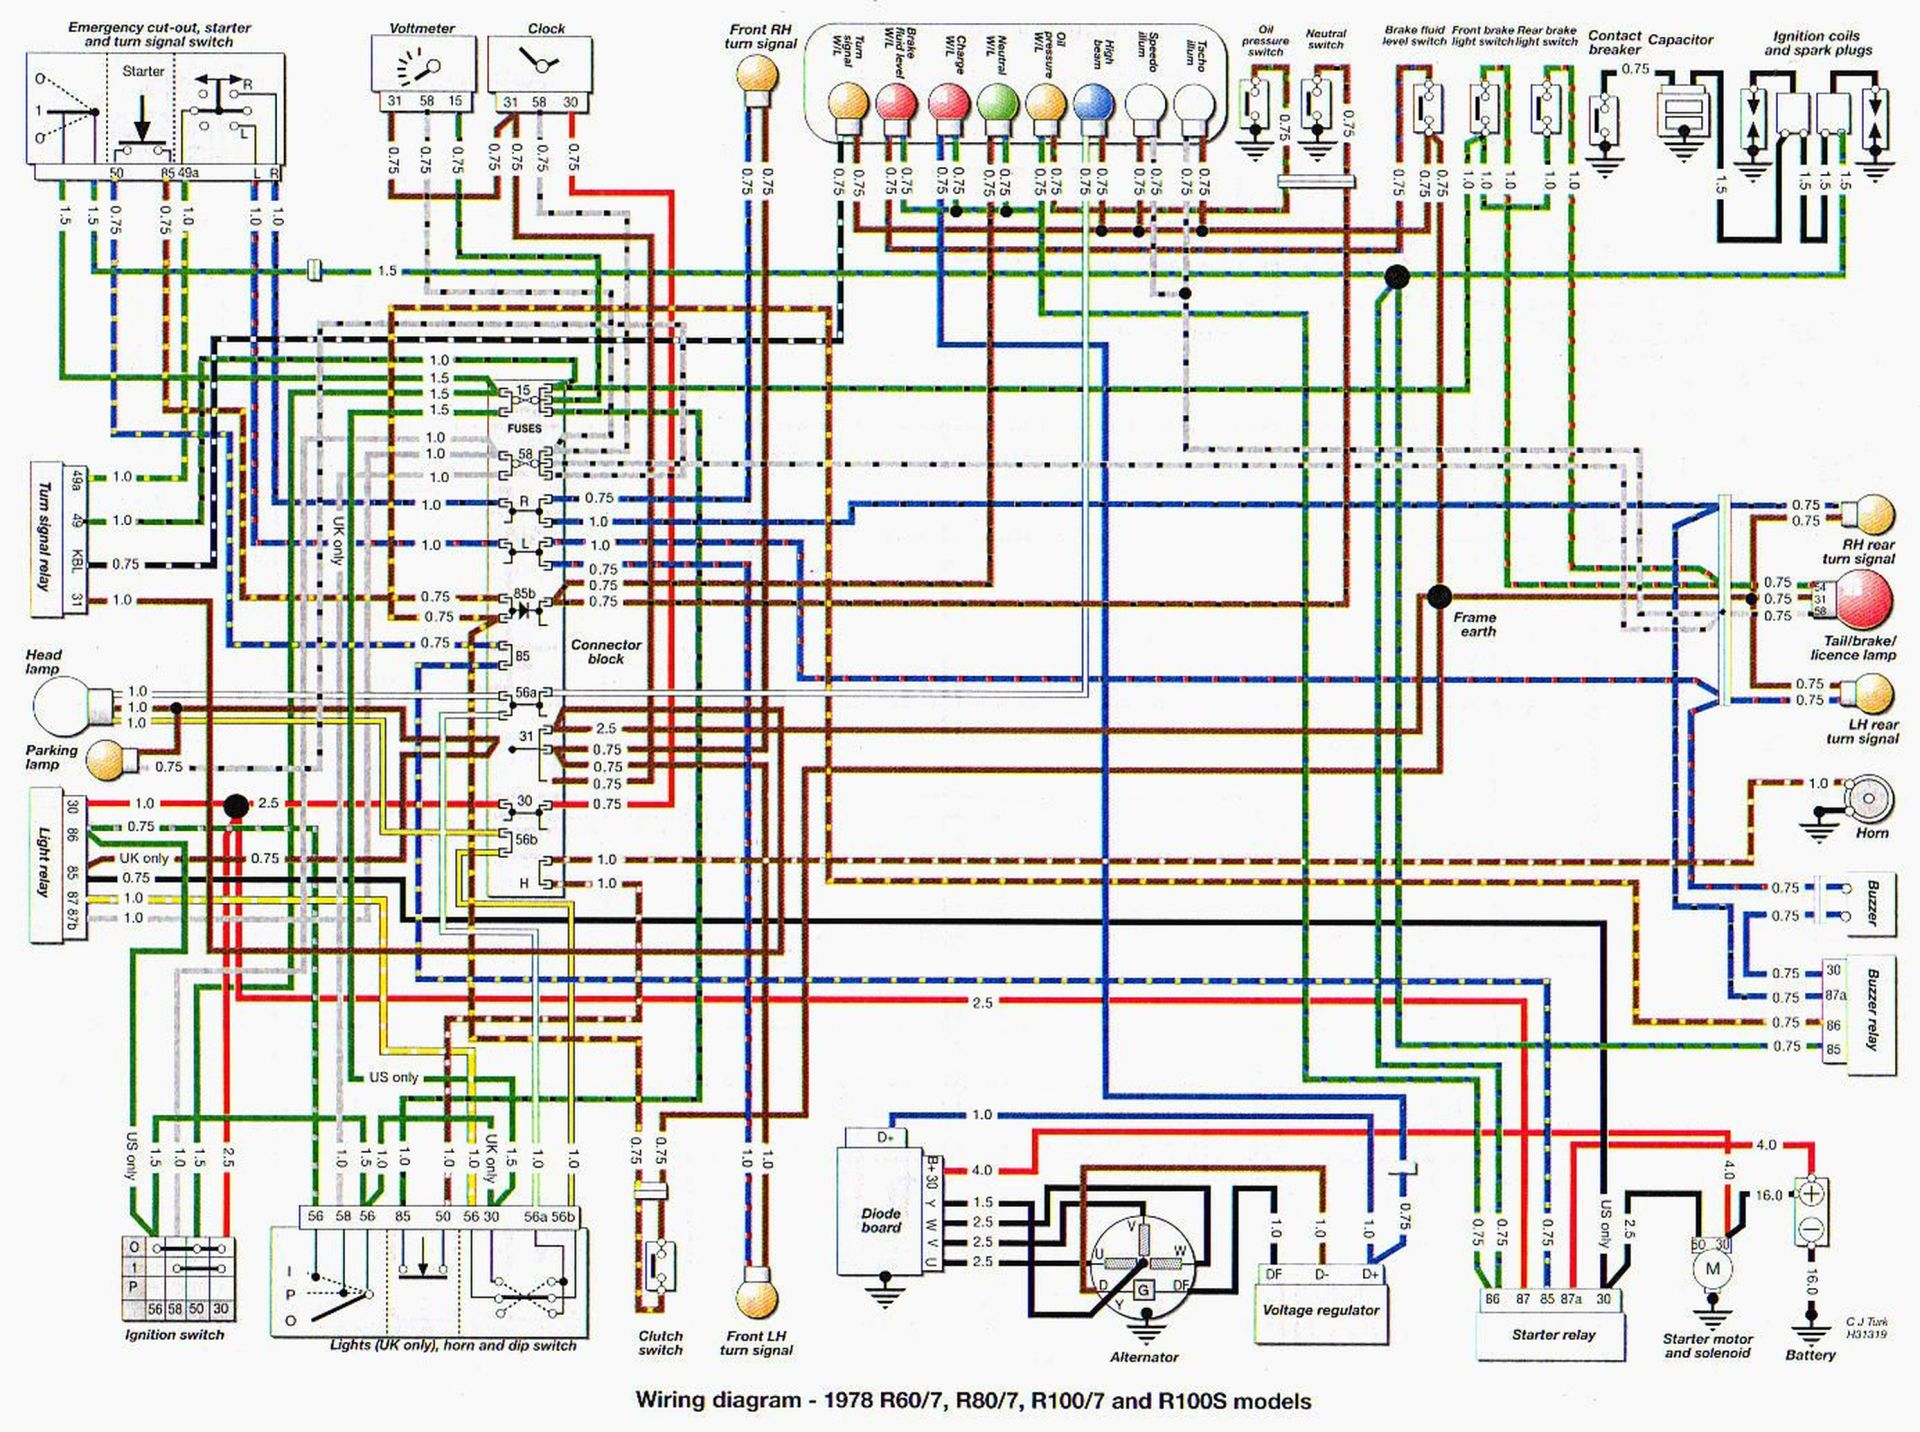 1976 bmw 2002 wiring diagram schematic bmw k1200rs for free wiring diagrams gain fuse10 klictravel nl  bmw k1200rs for free wiring diagrams